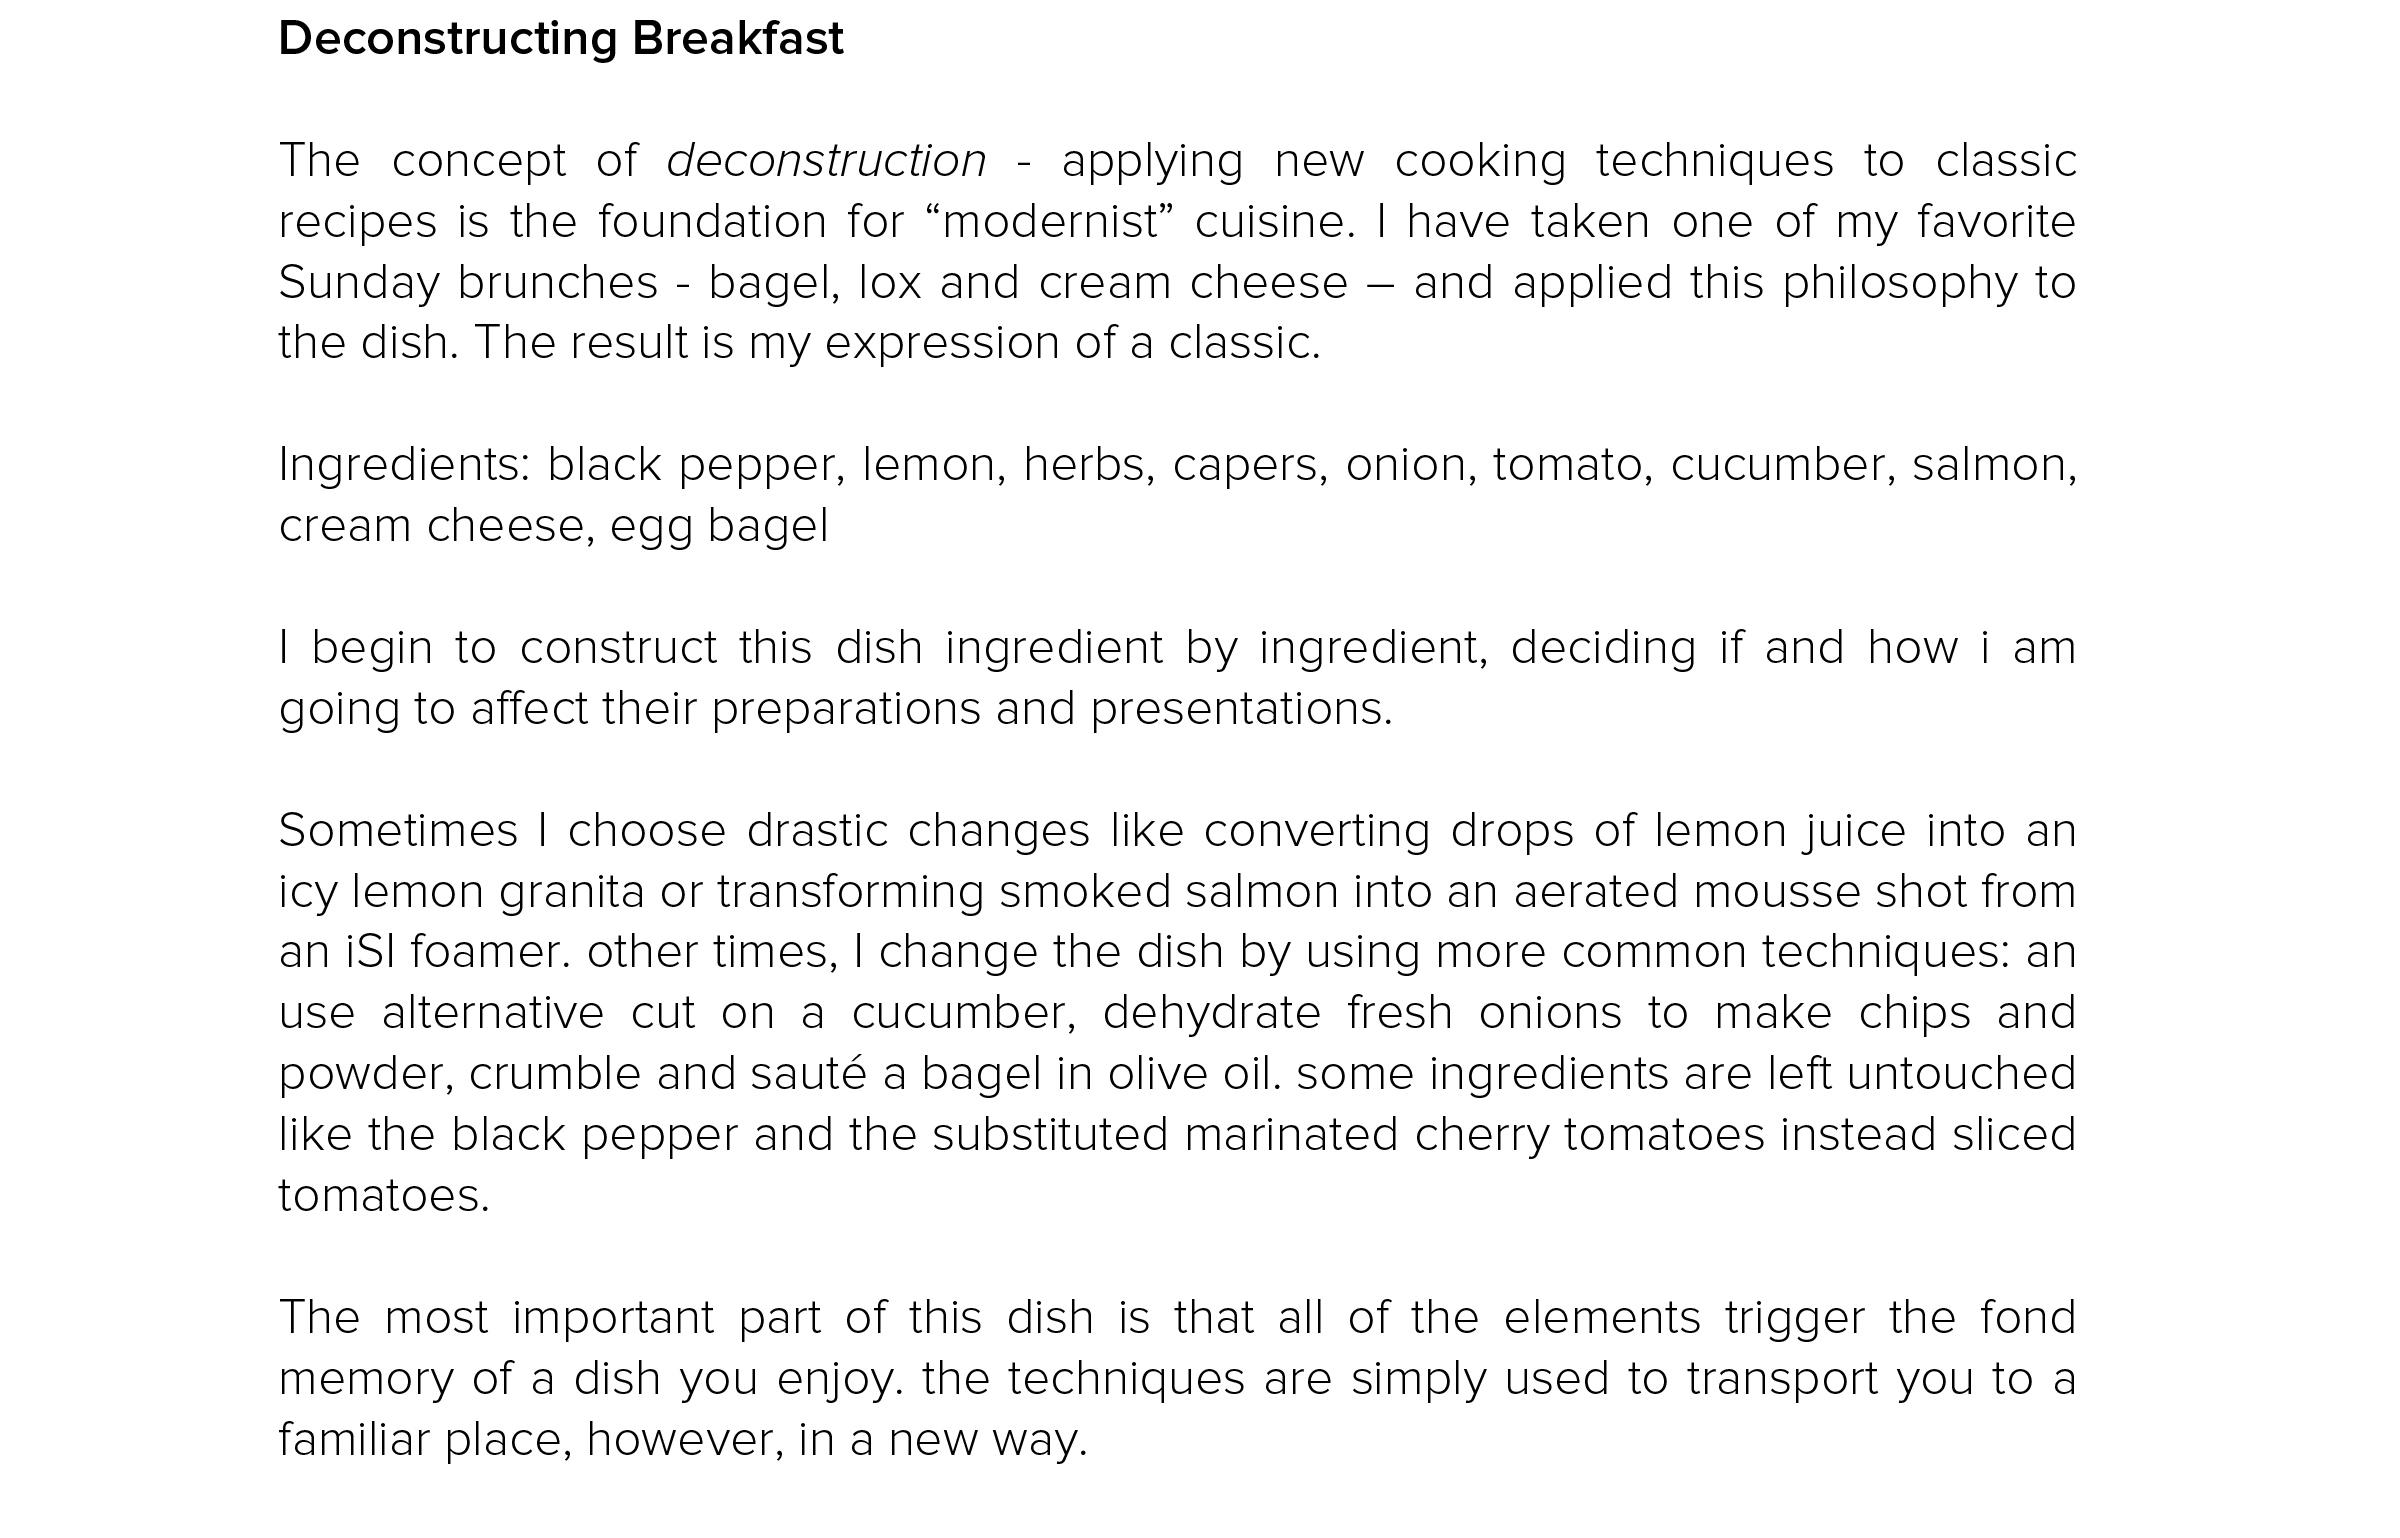 1. Deconstructing Breakfast.jpg